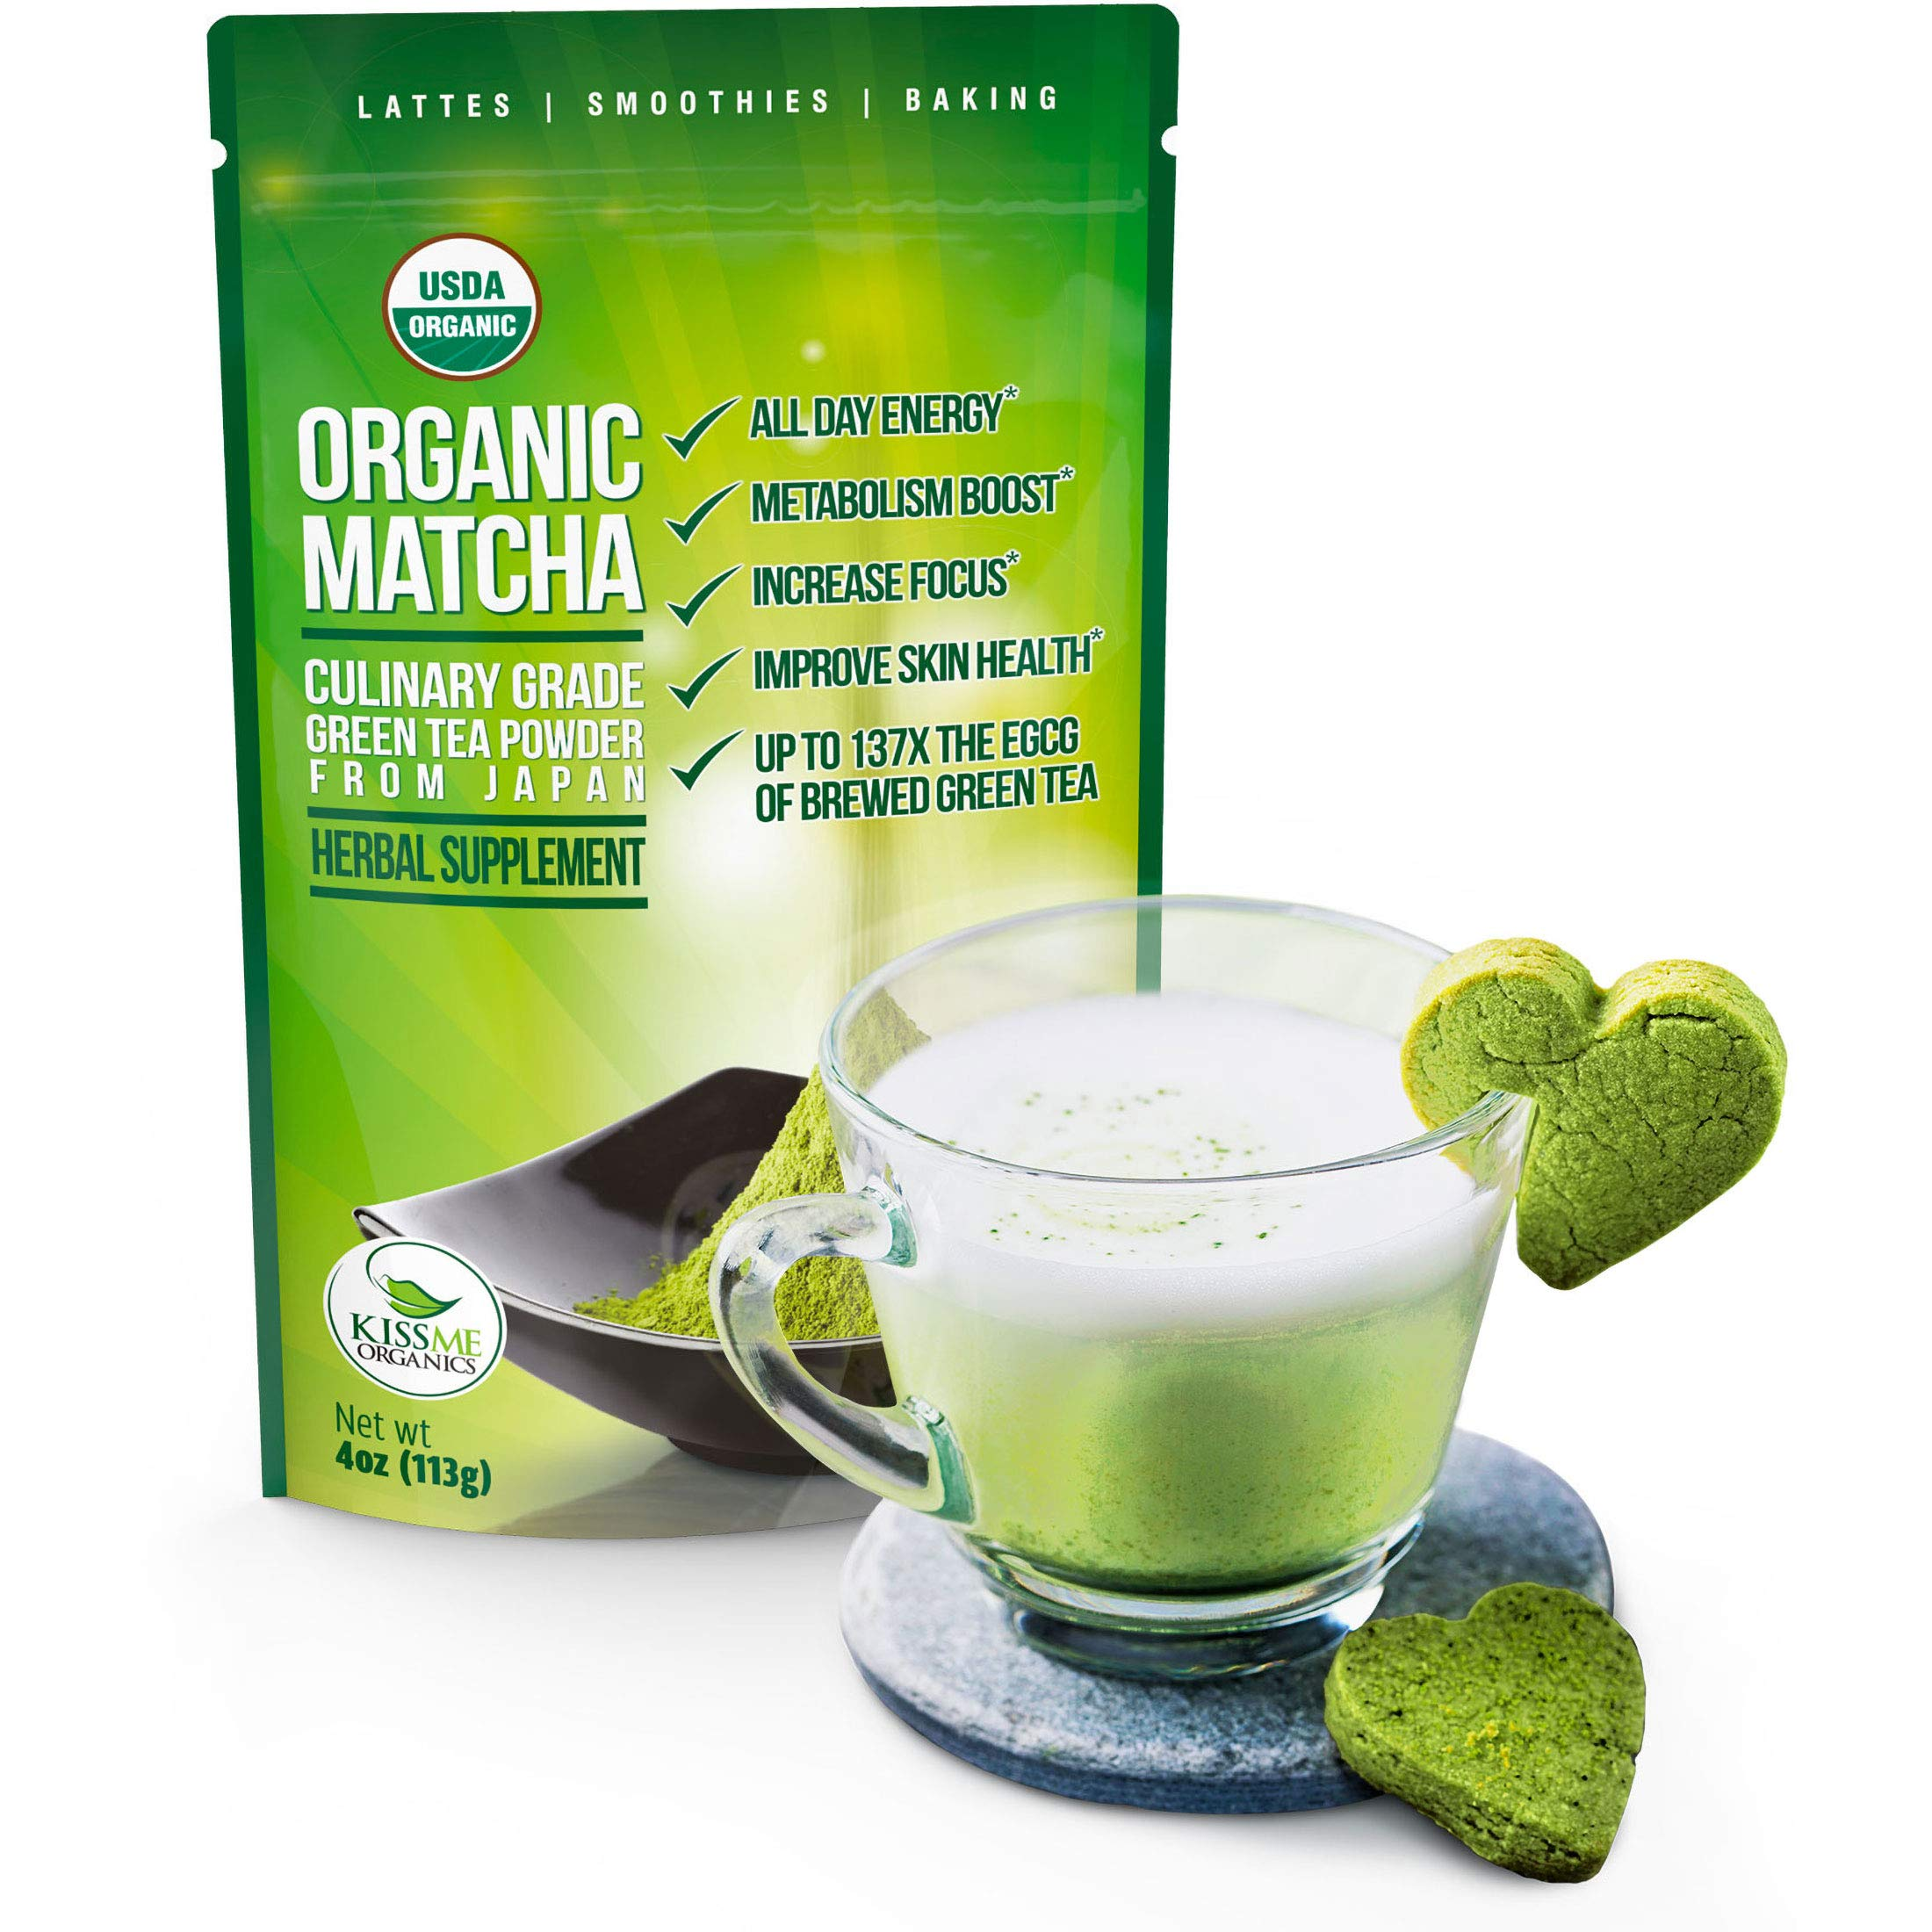 Kiss Me Organics Matcha Green Tea Powder - Organic Japanese Culinary Grade Matcha - 4 ounces (113 grams) by Kiss Me Organics